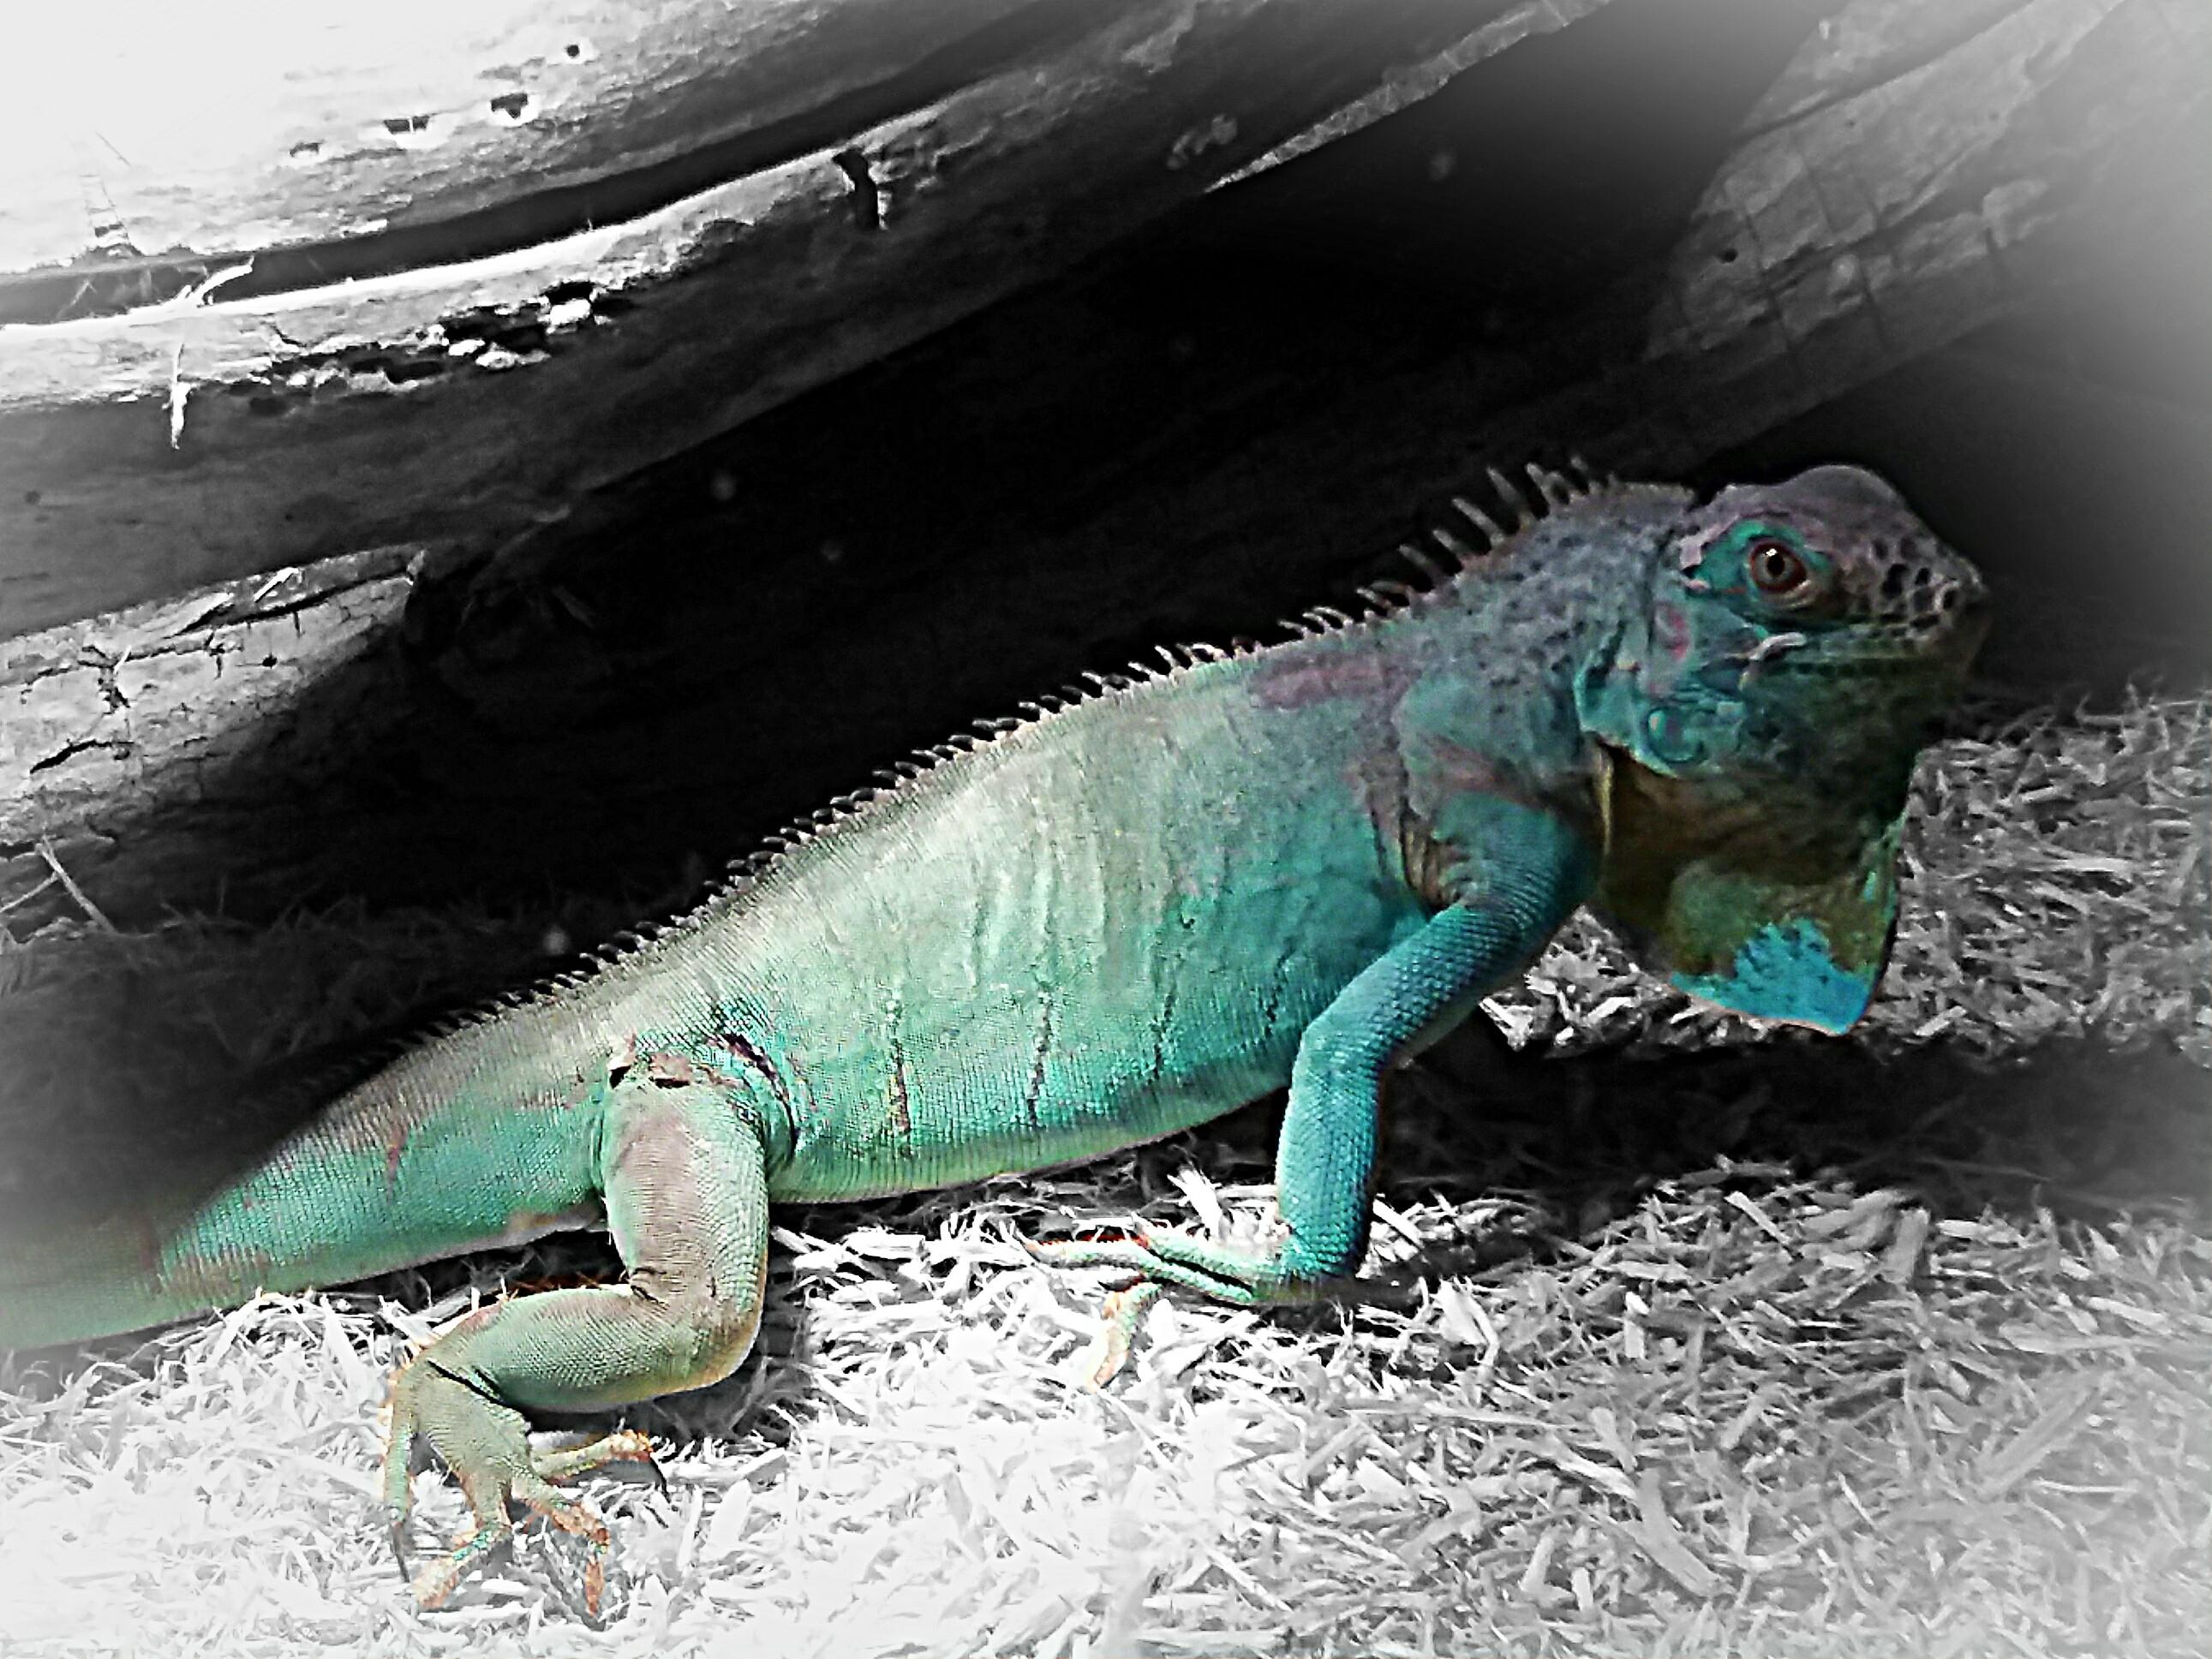 Blue Iguana For Sale : Blue iguana for sale in muntinlupa city national capital region